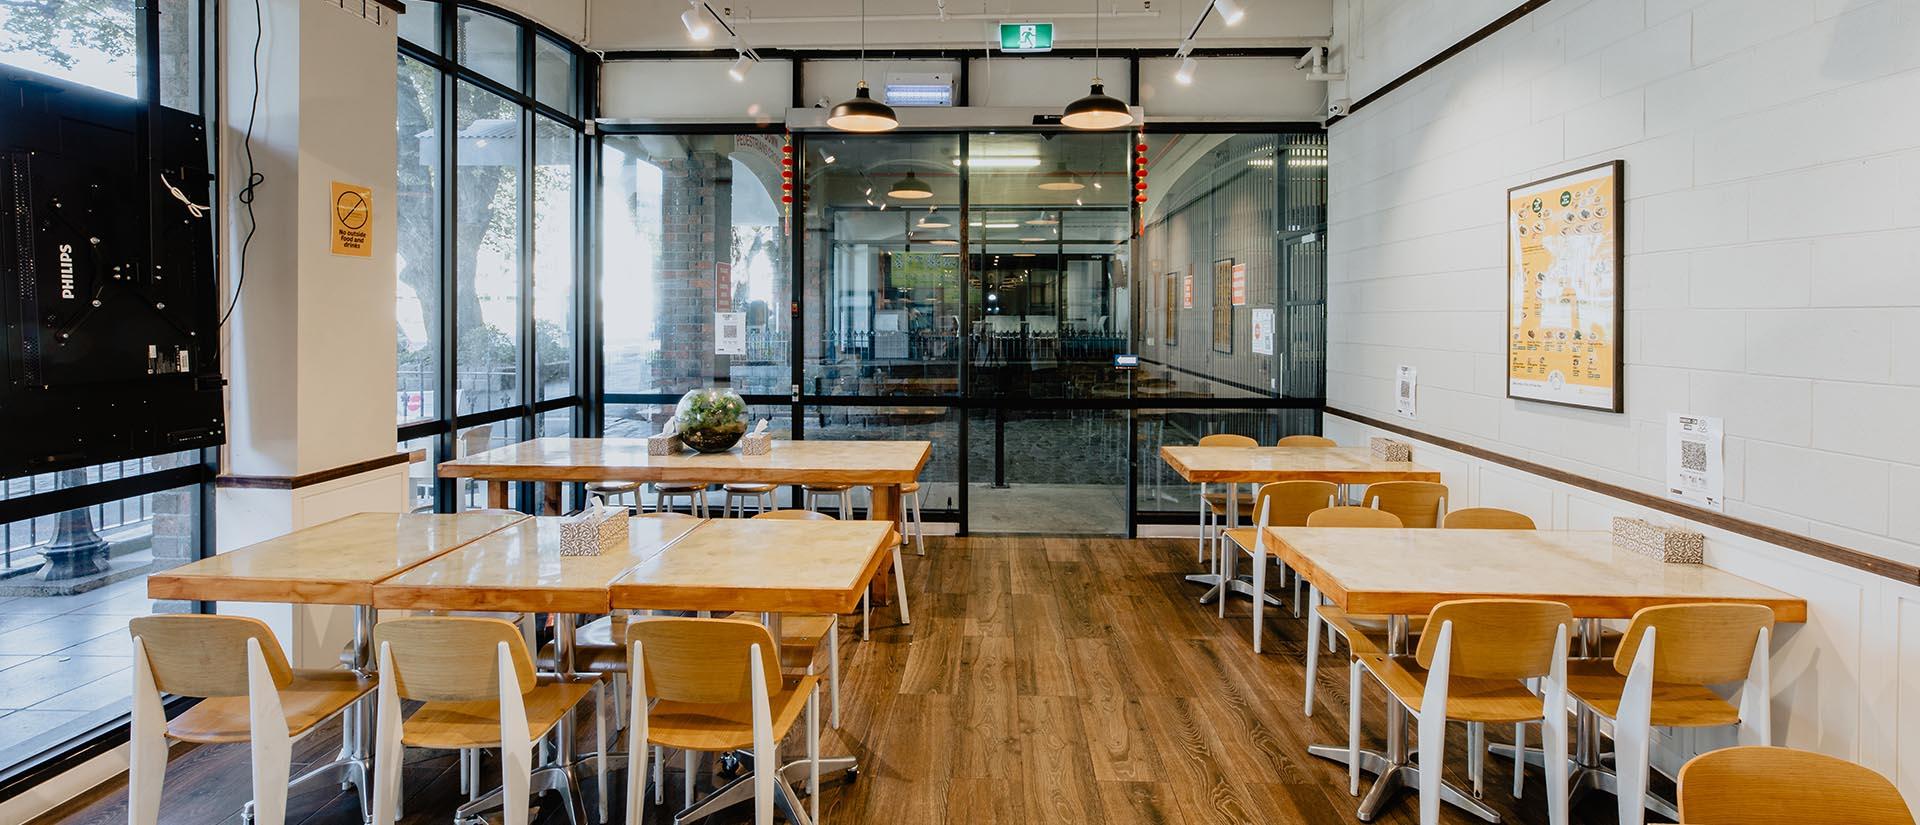 Projects-Restaurant_Gai Wong-4